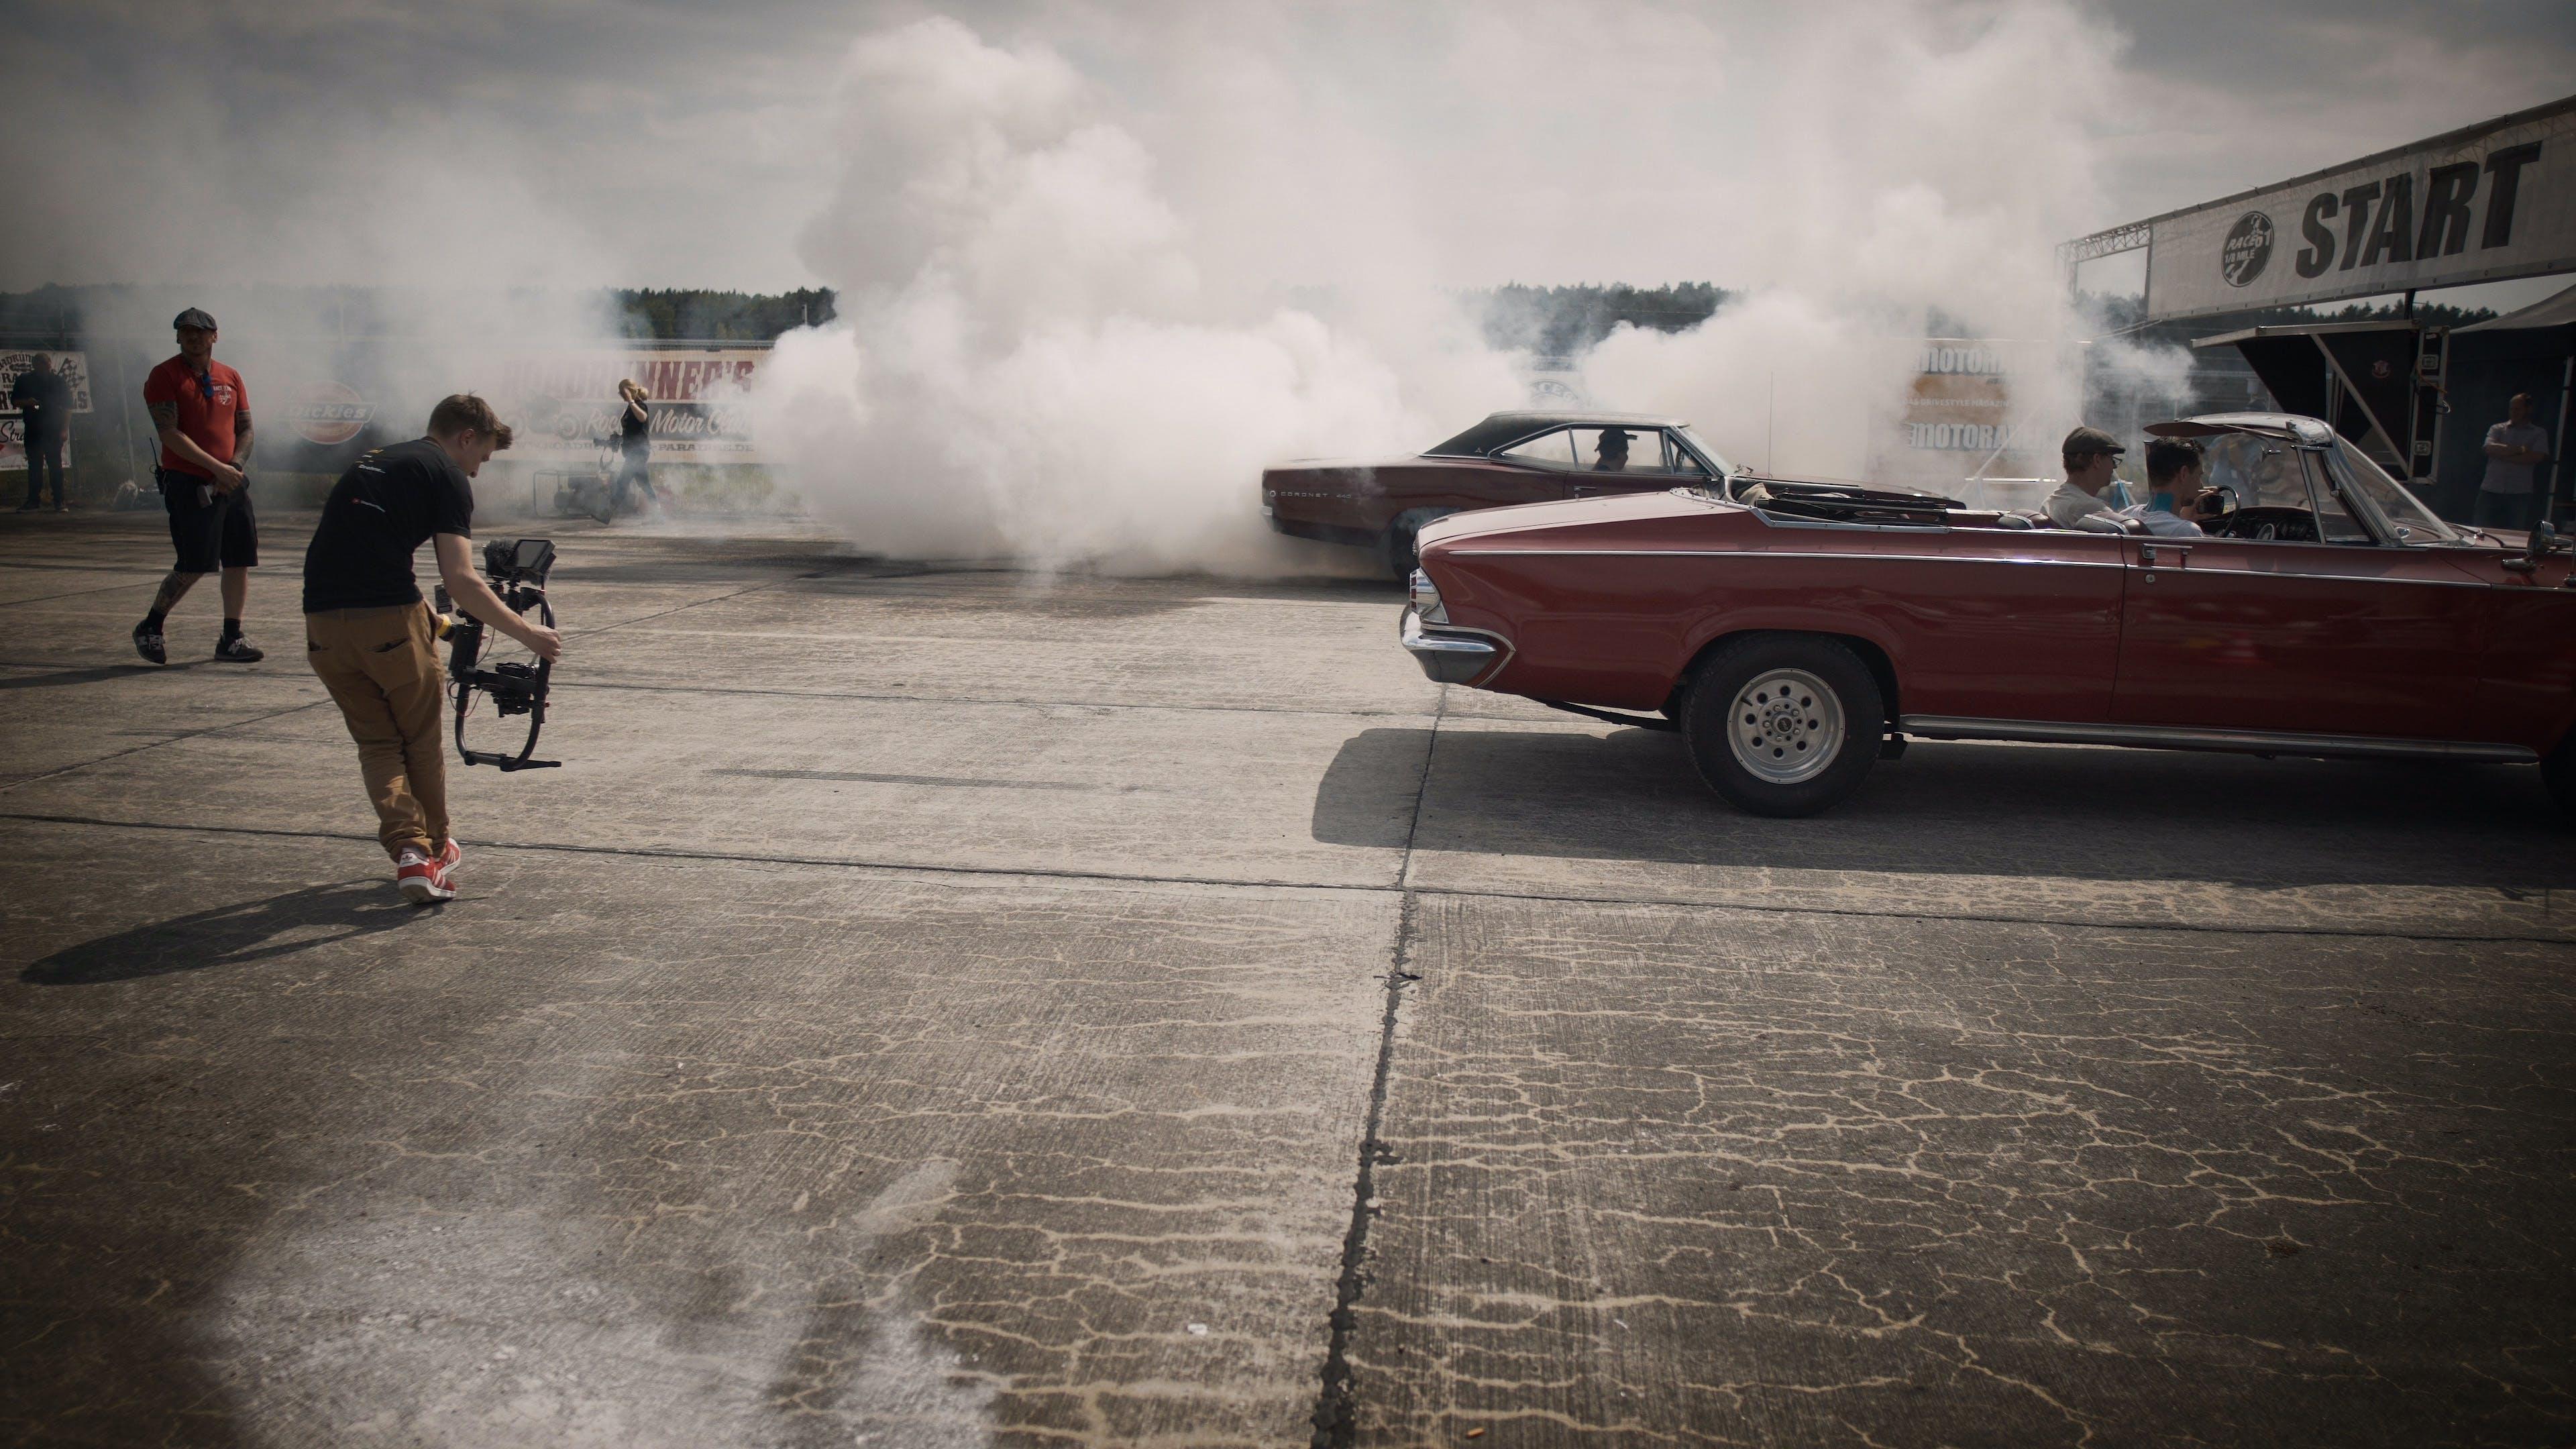 Free stock photo of smoke, burnout, muscle car, drag race